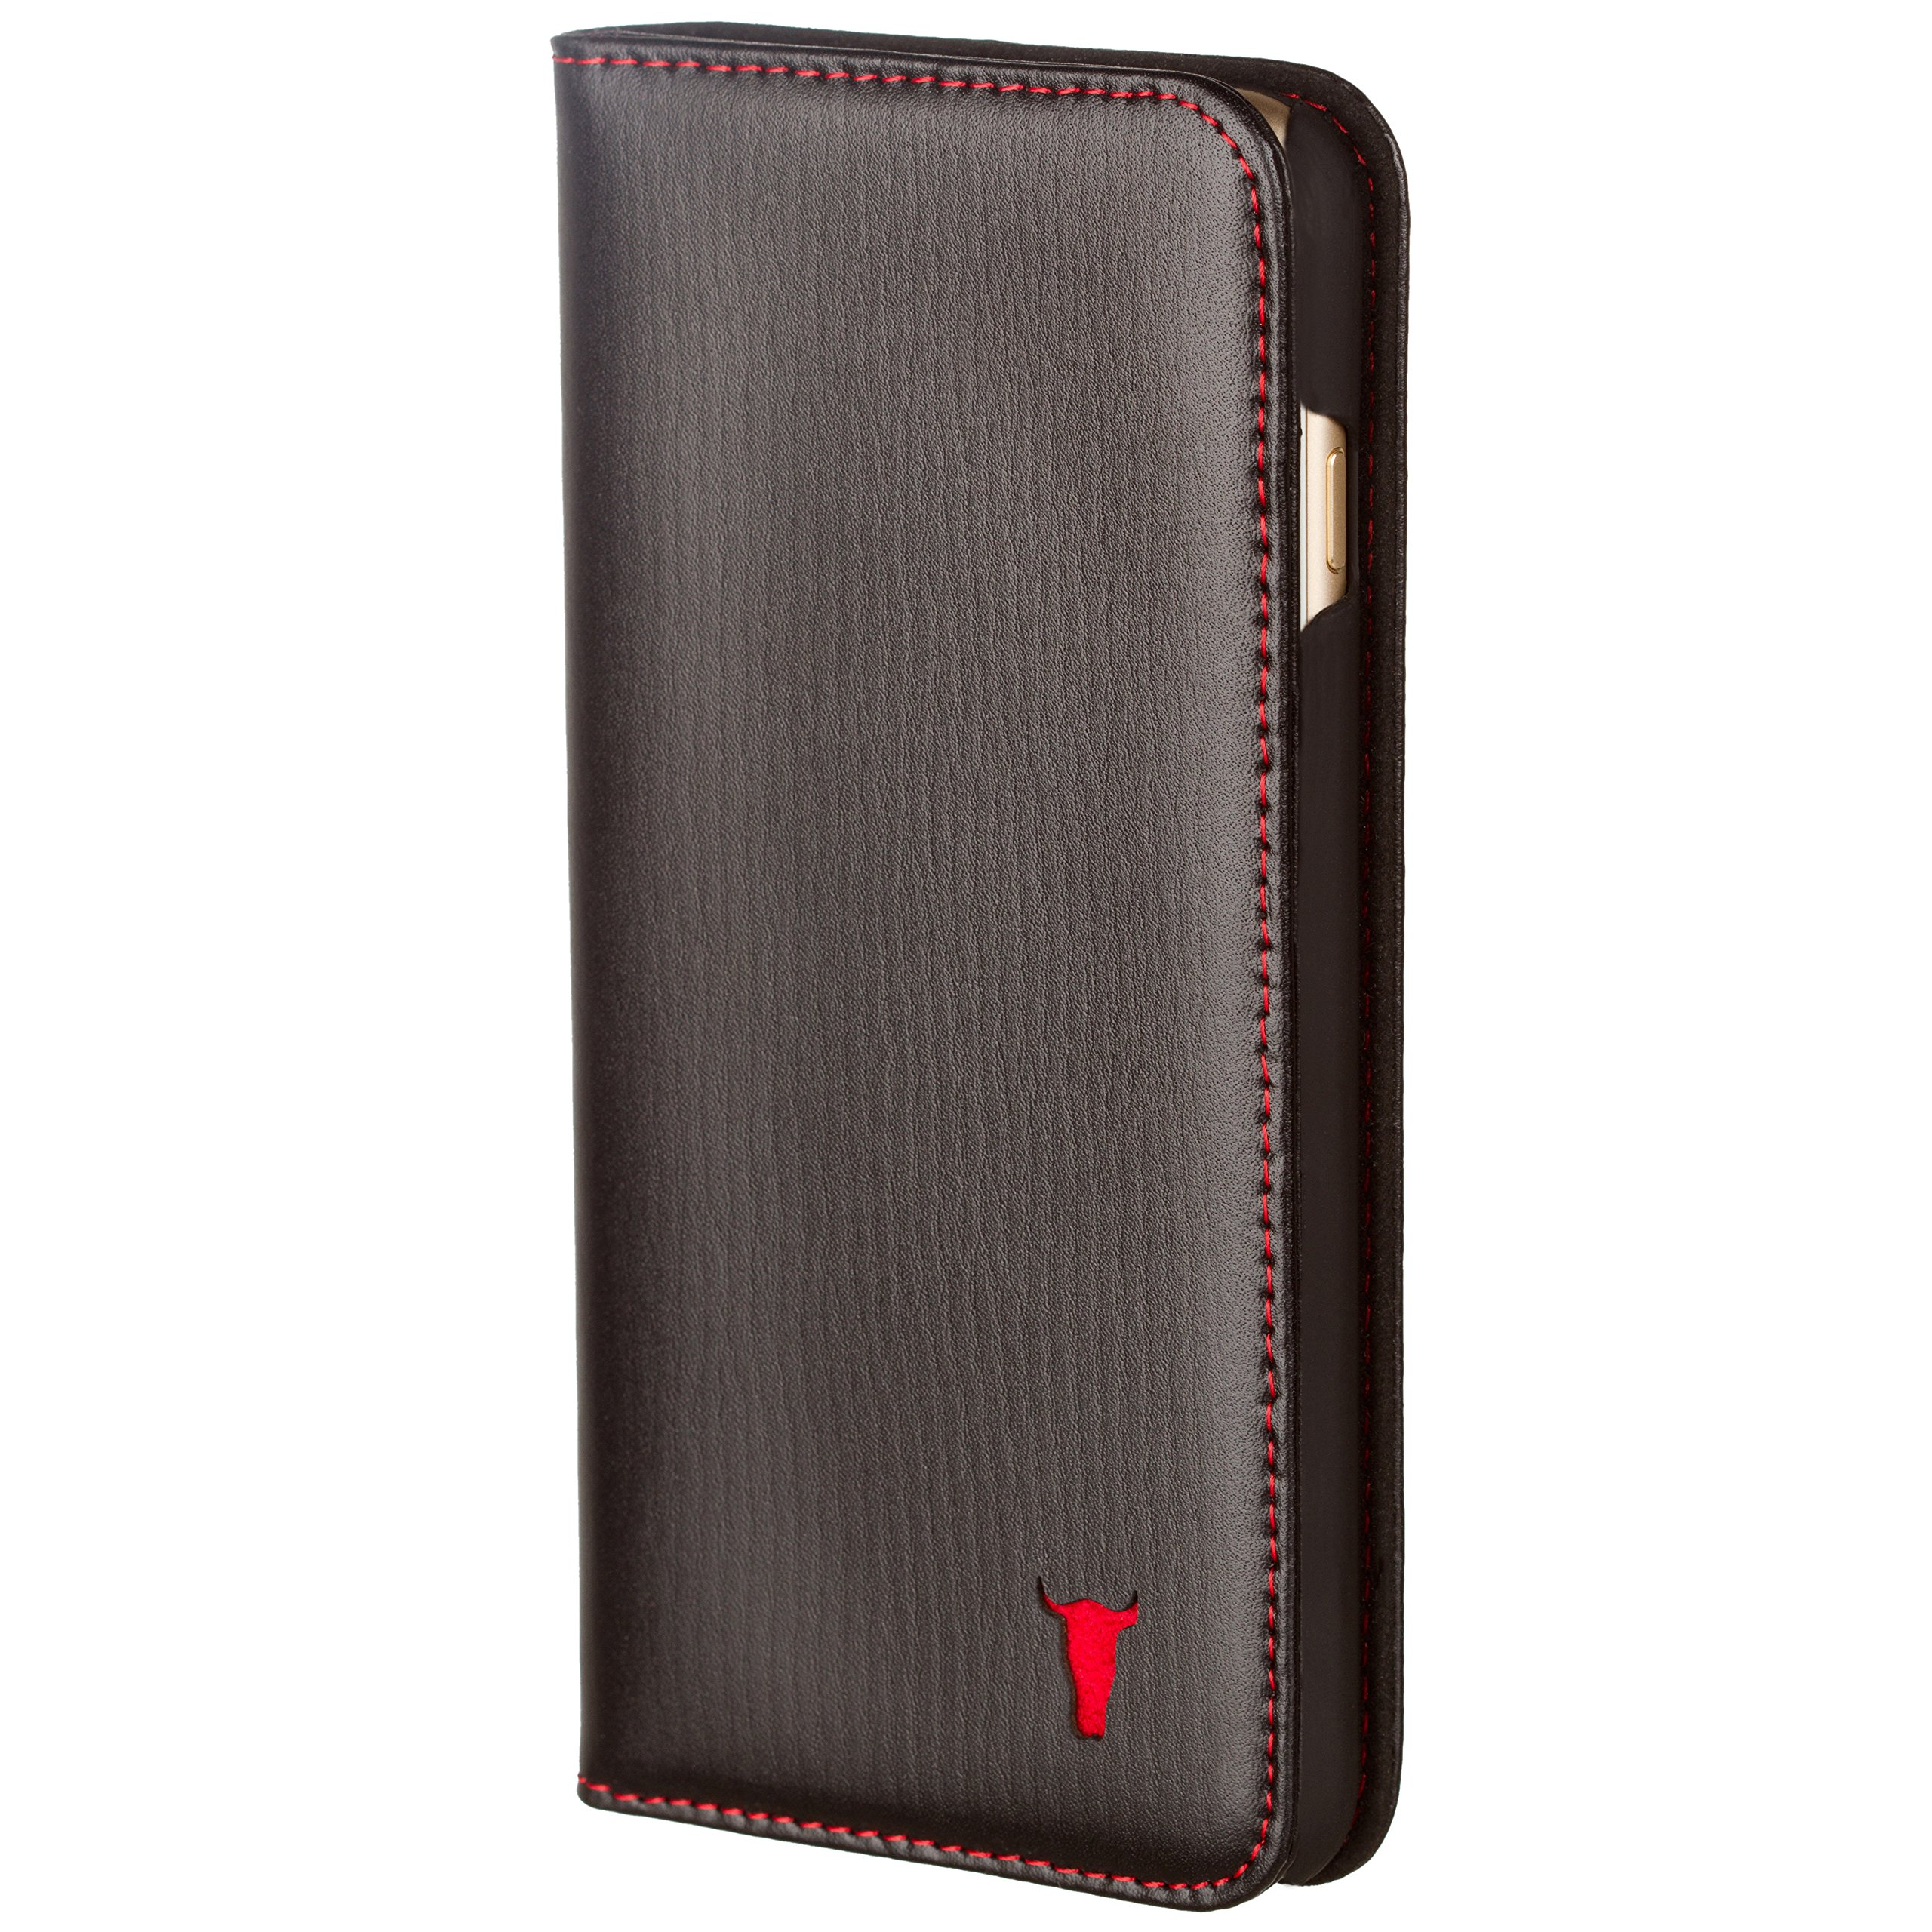 TORRO iPhone 8 Plus Case/cover. Premium Slim Leather Stand Case for Apple iPhone by (iPhone 7 Plus/8 Plus Black)